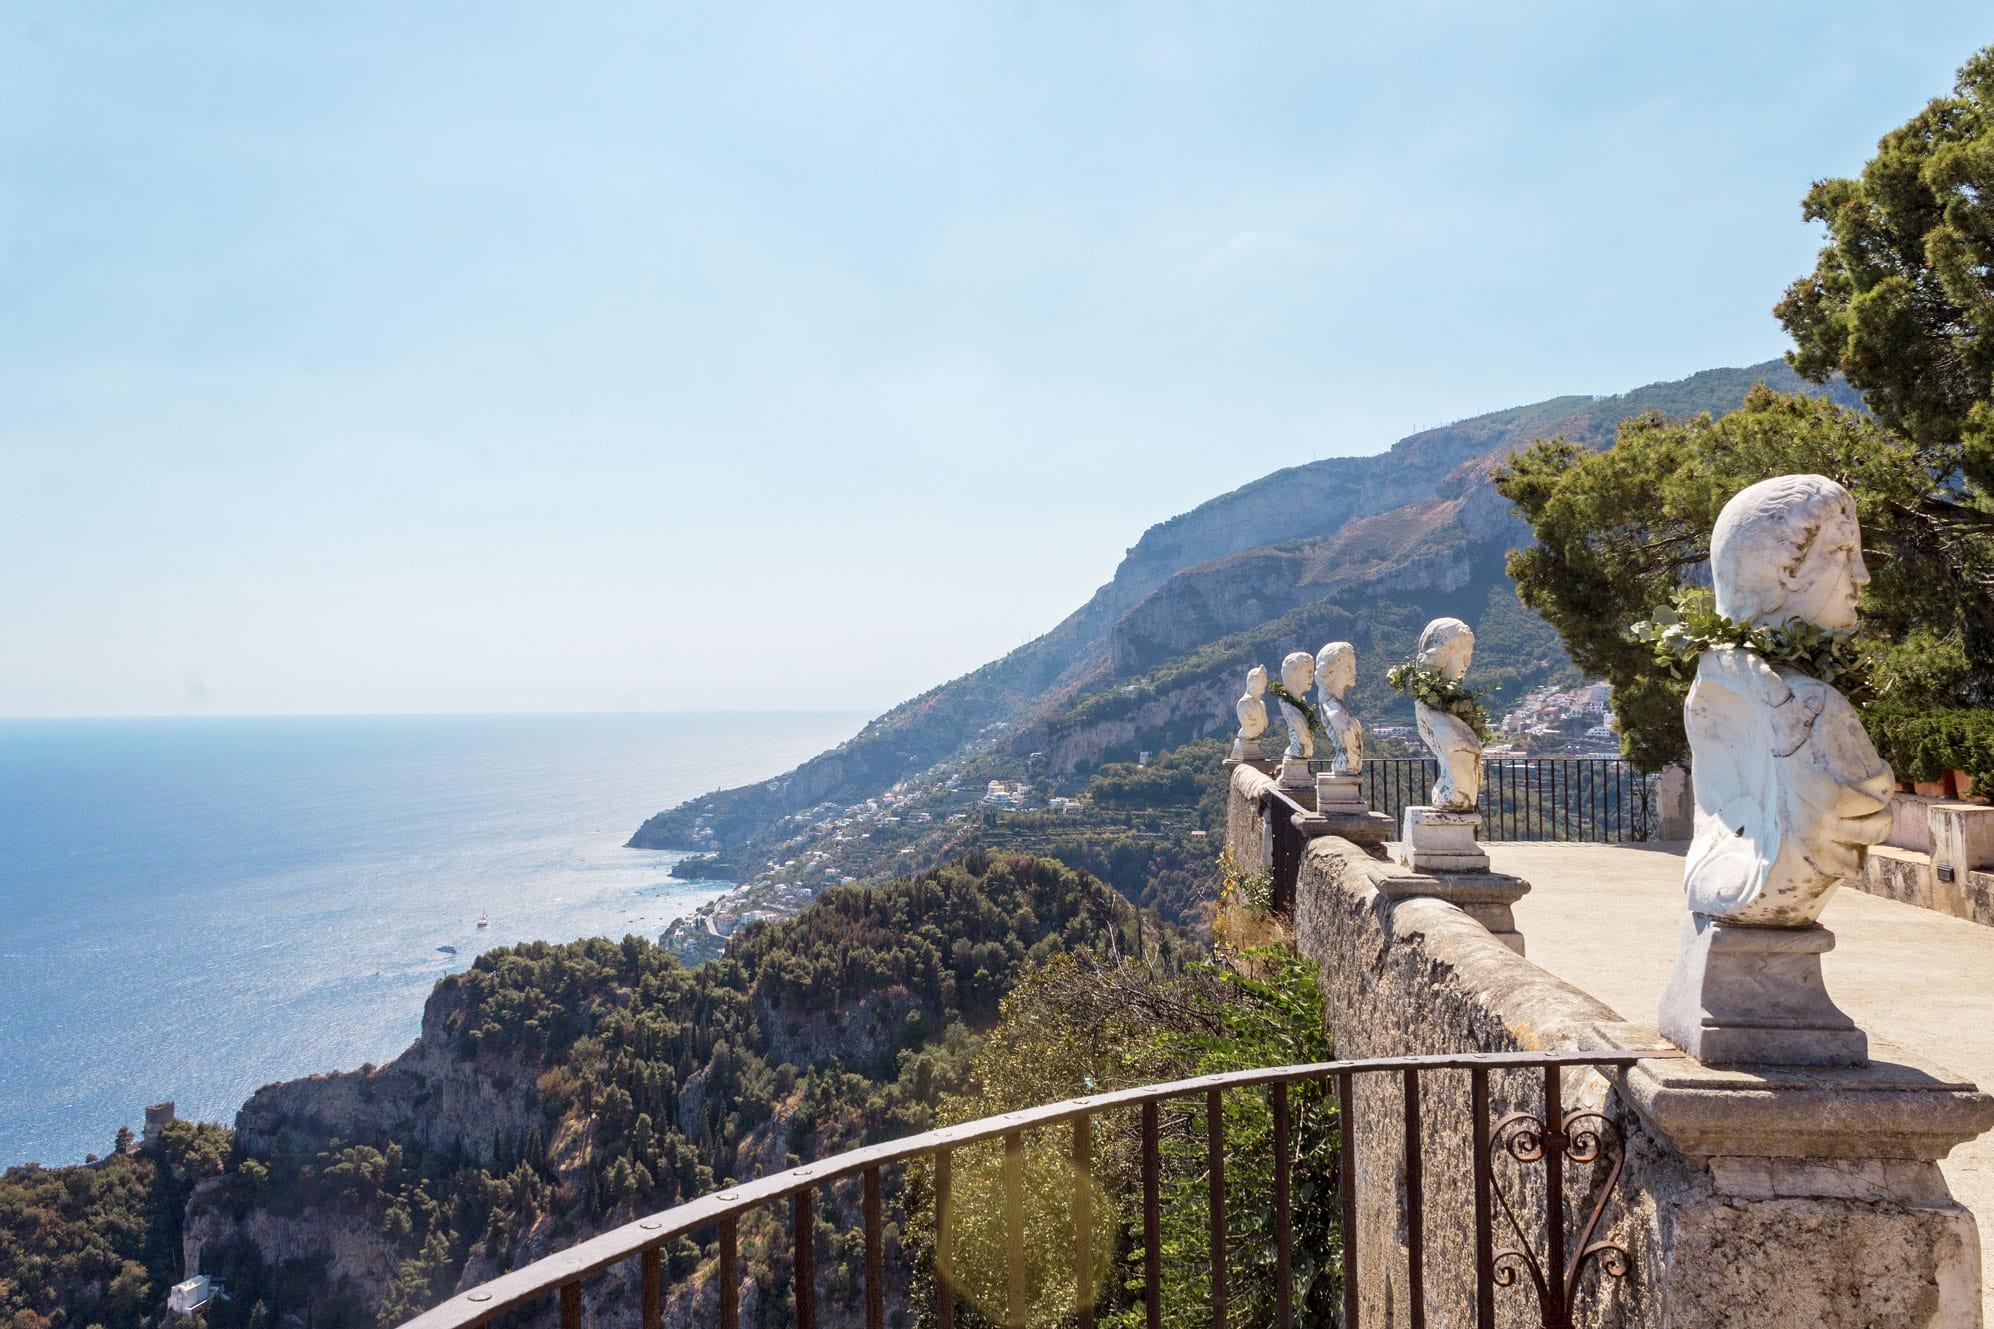 ravello villa cimbrone amalfi coast itinerary